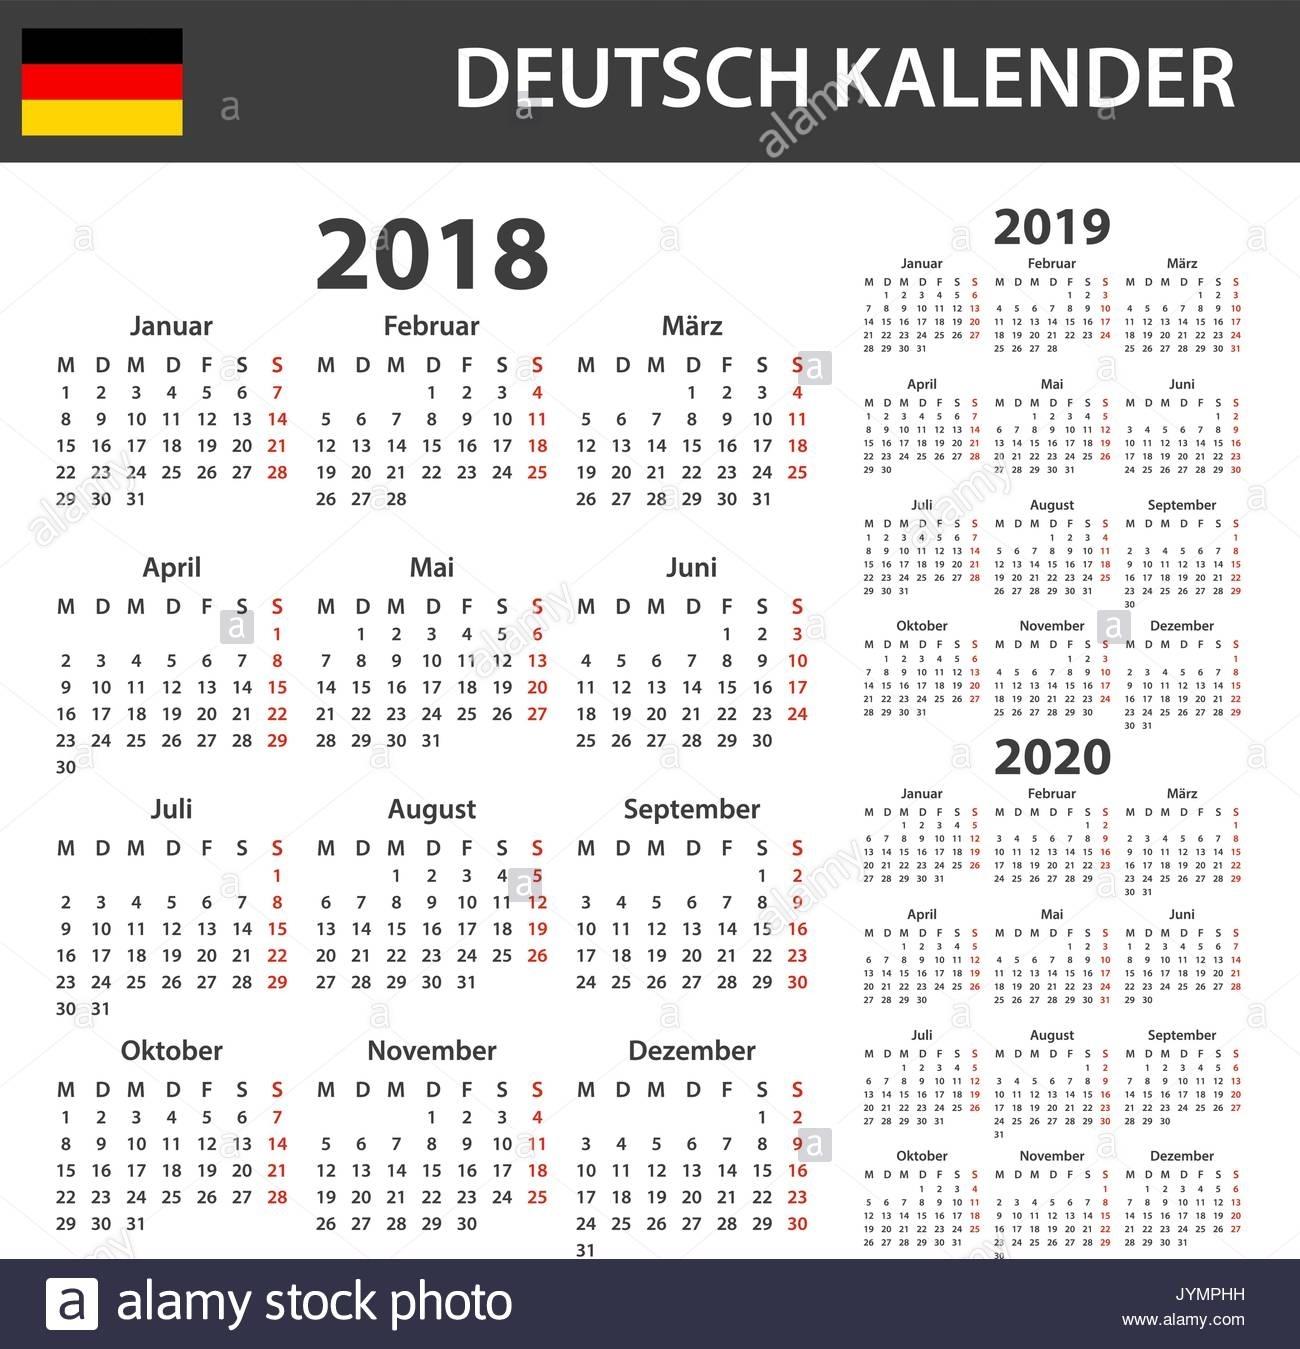 German Calendar For 2018, 2019 And 2020. Scheduler, Agenda